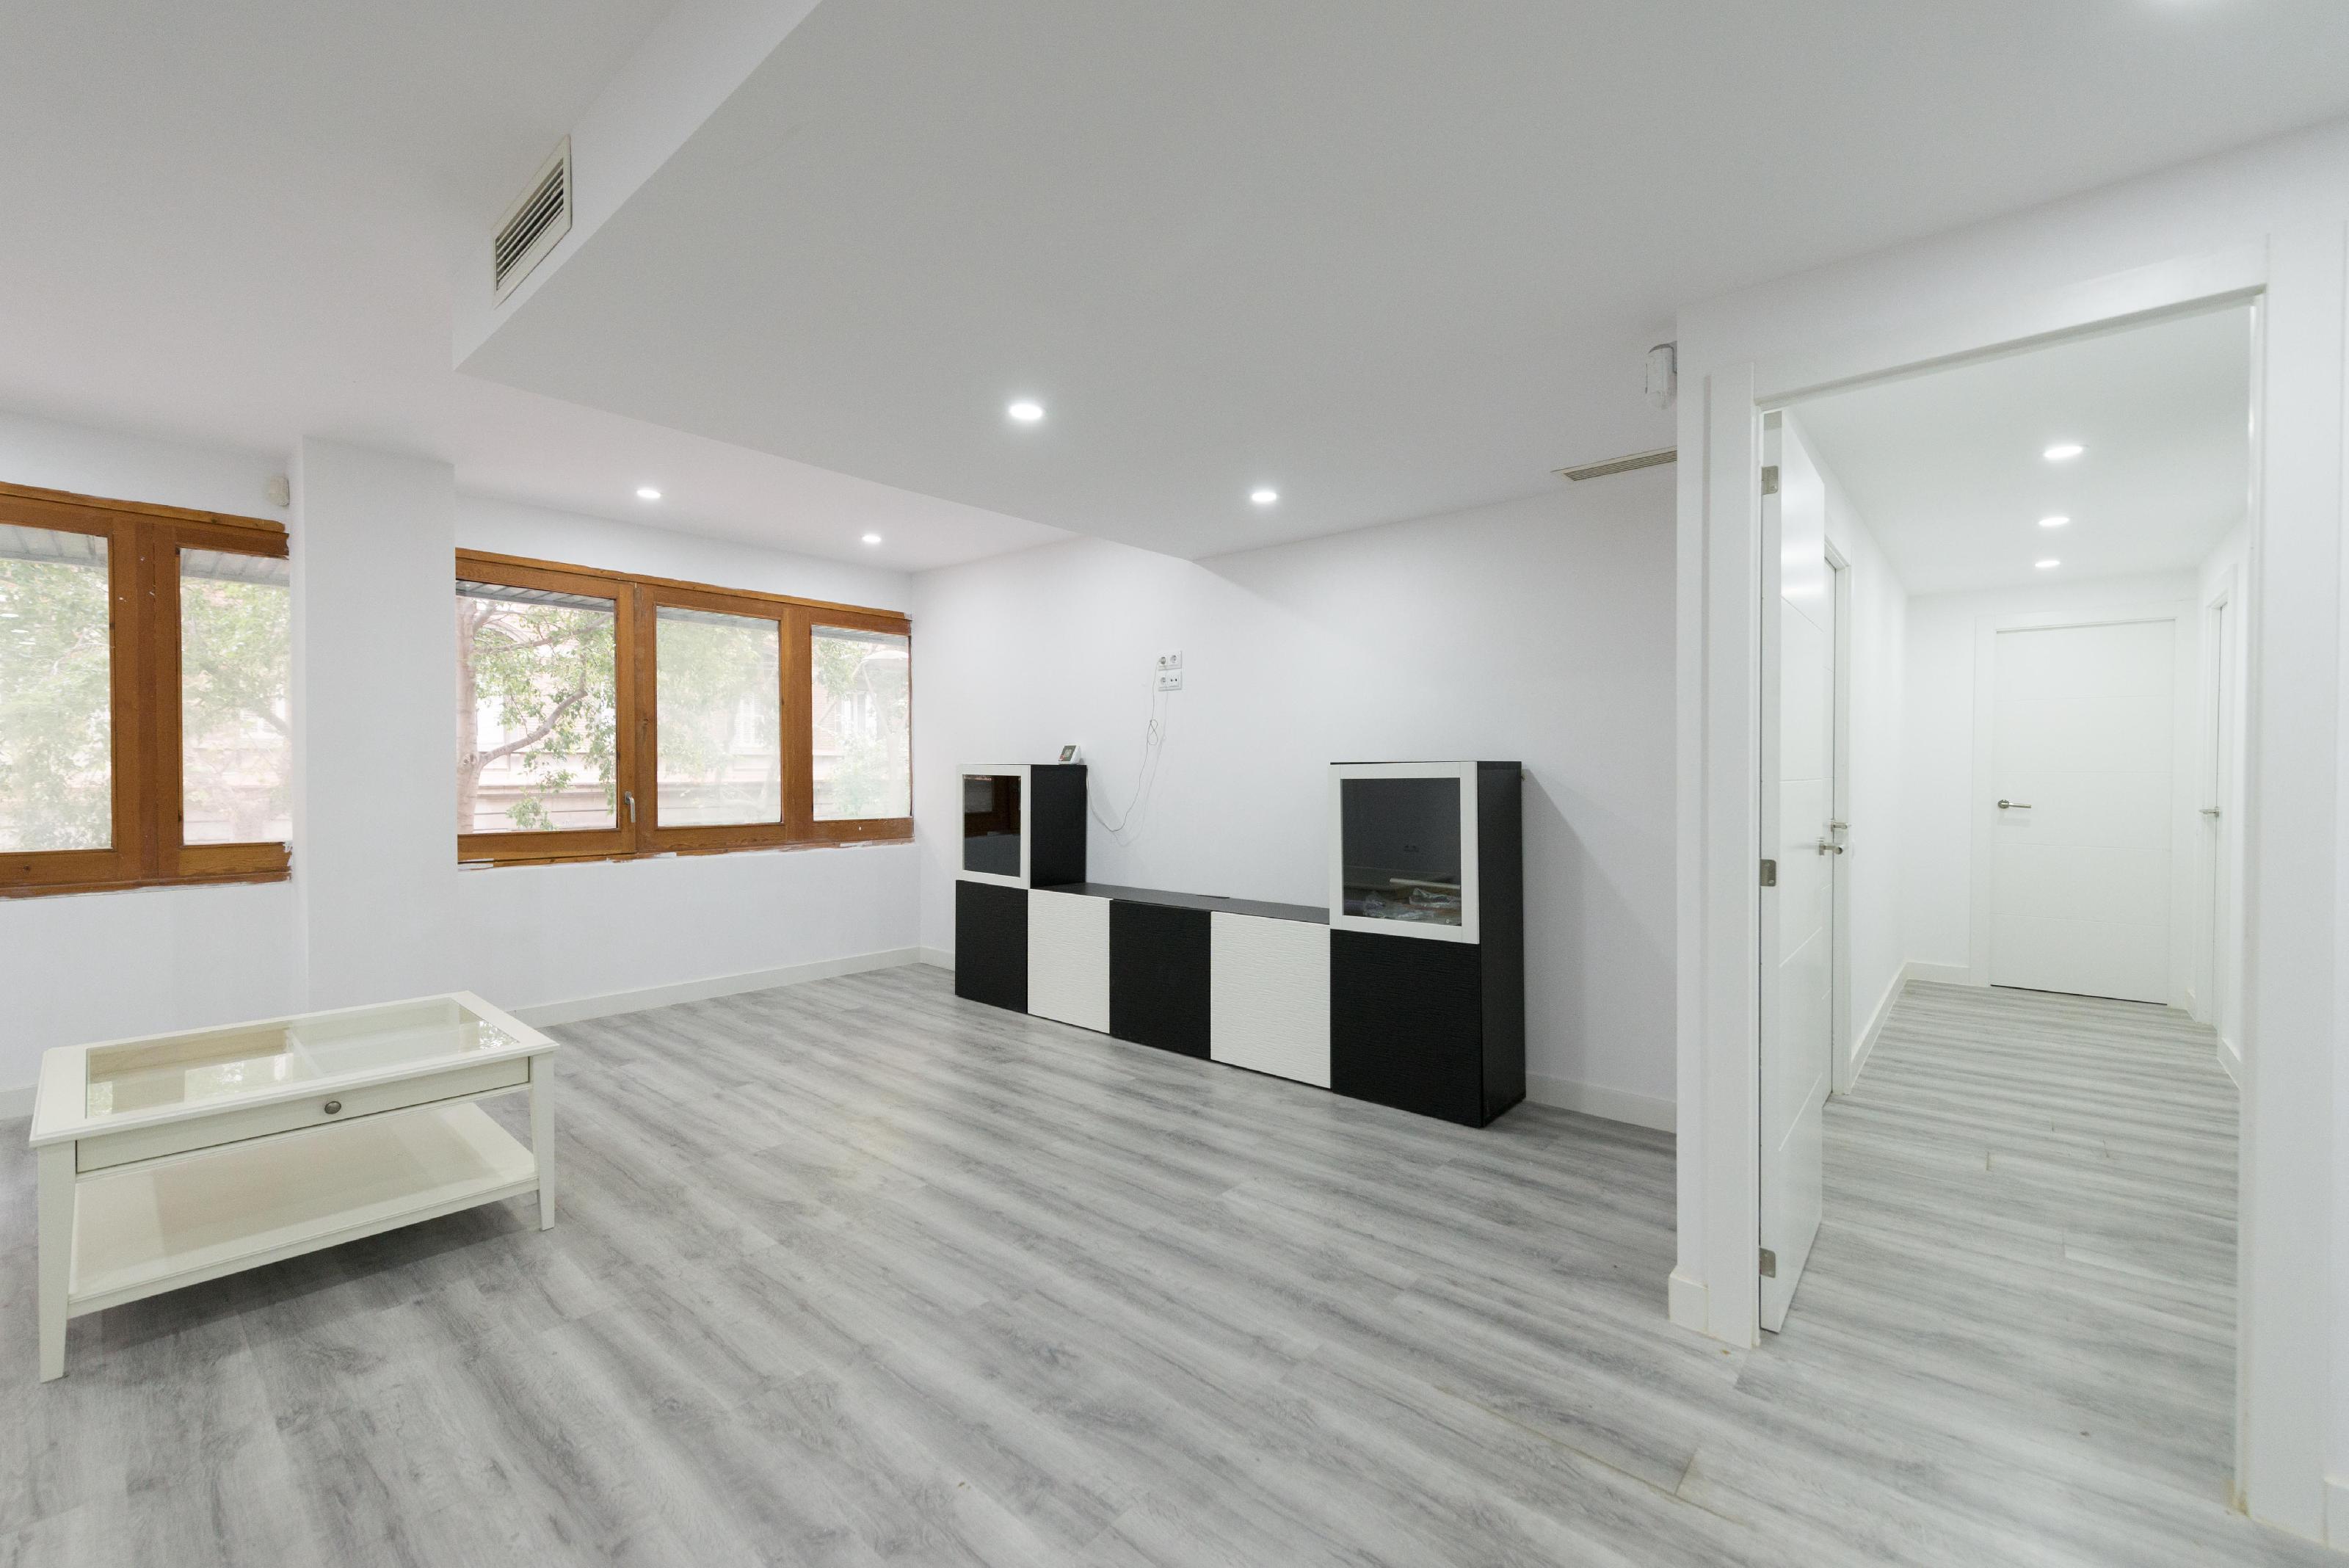 242980 Flat for sale in Eixample, Sagrada Familia 8